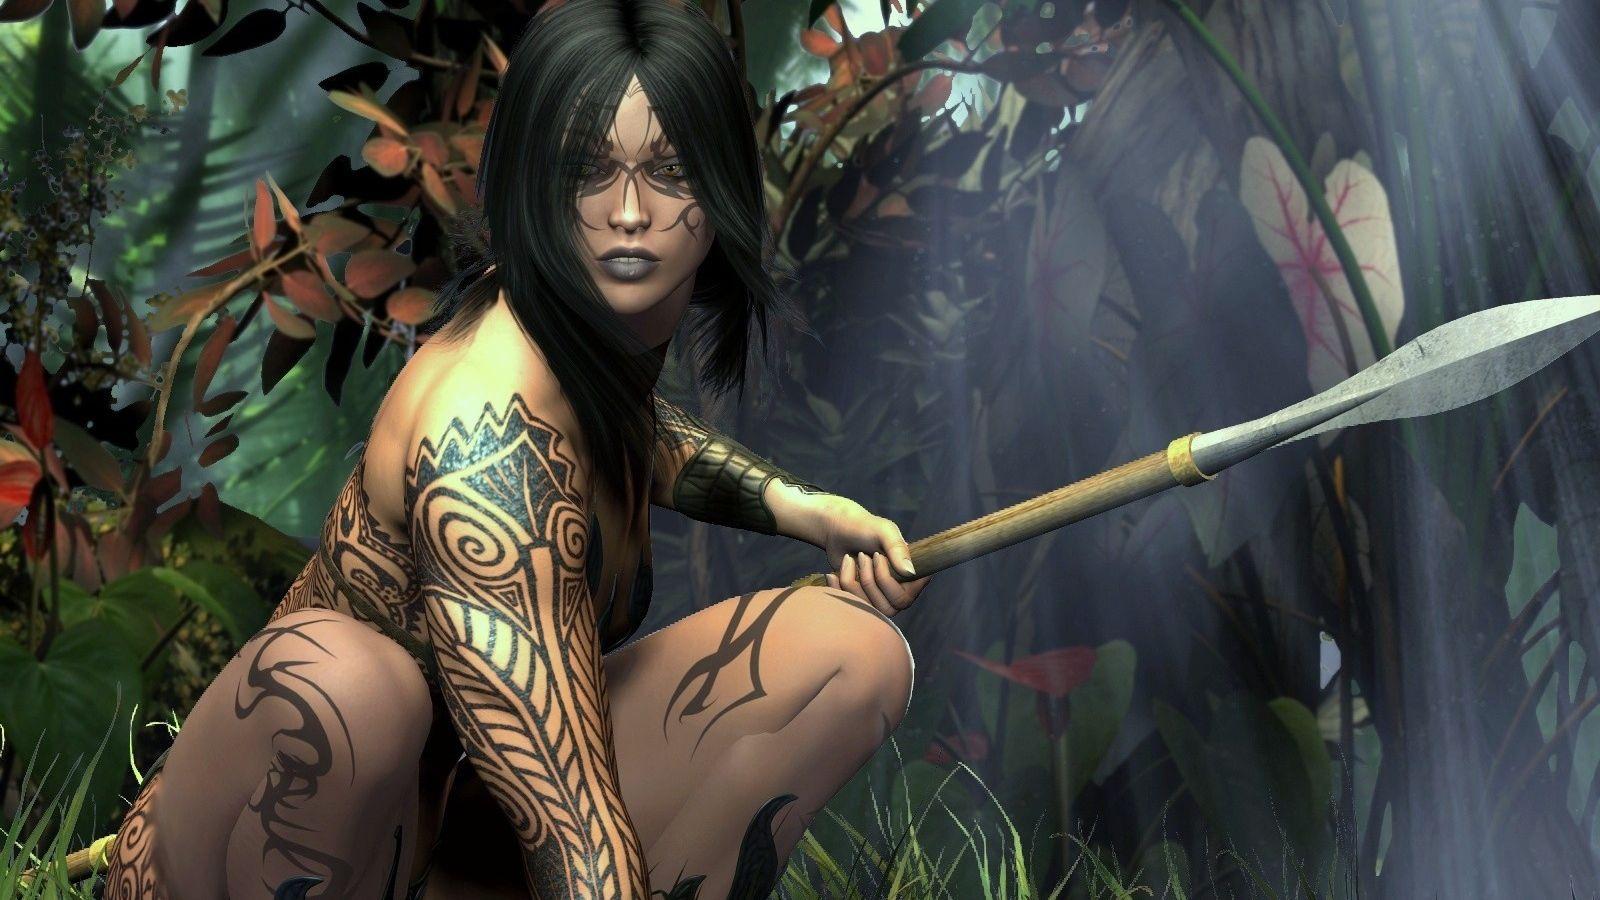 Women Warrior Wallpaper and Background | 1572x1215 | ID:231165